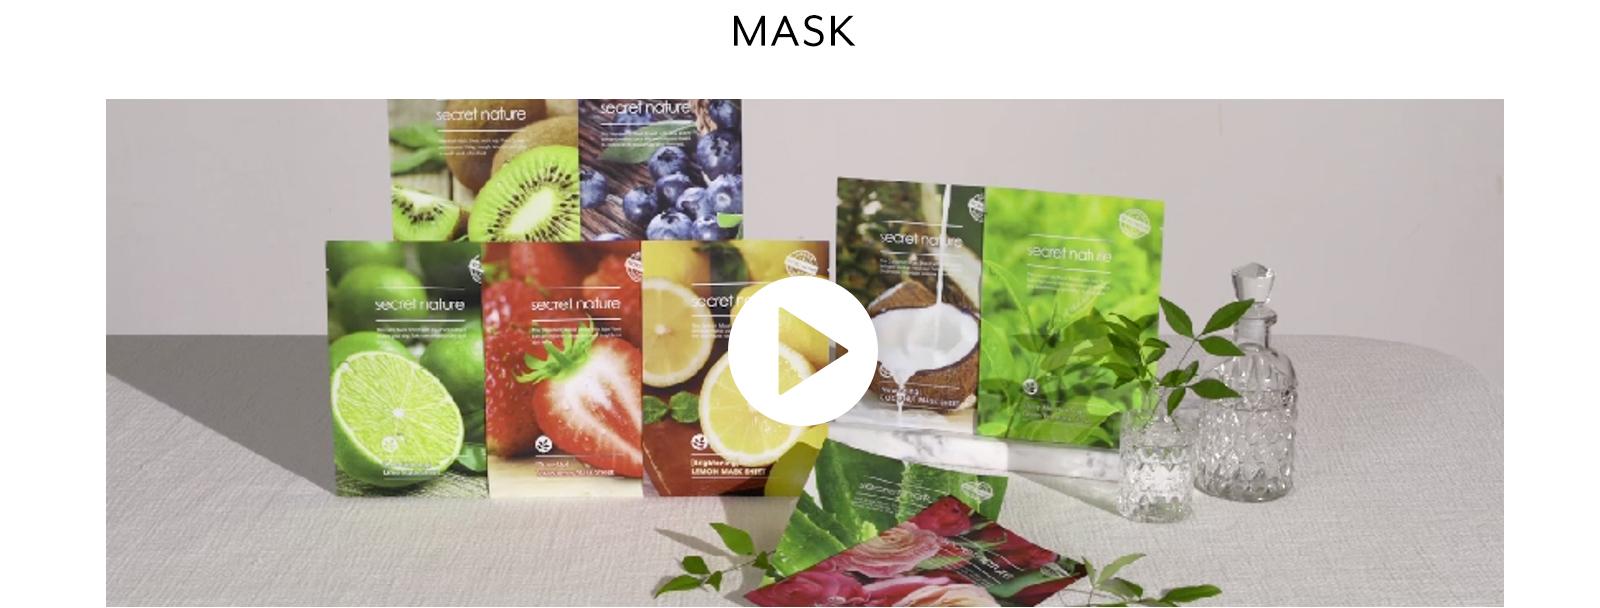 secret nature Video 101 - 3